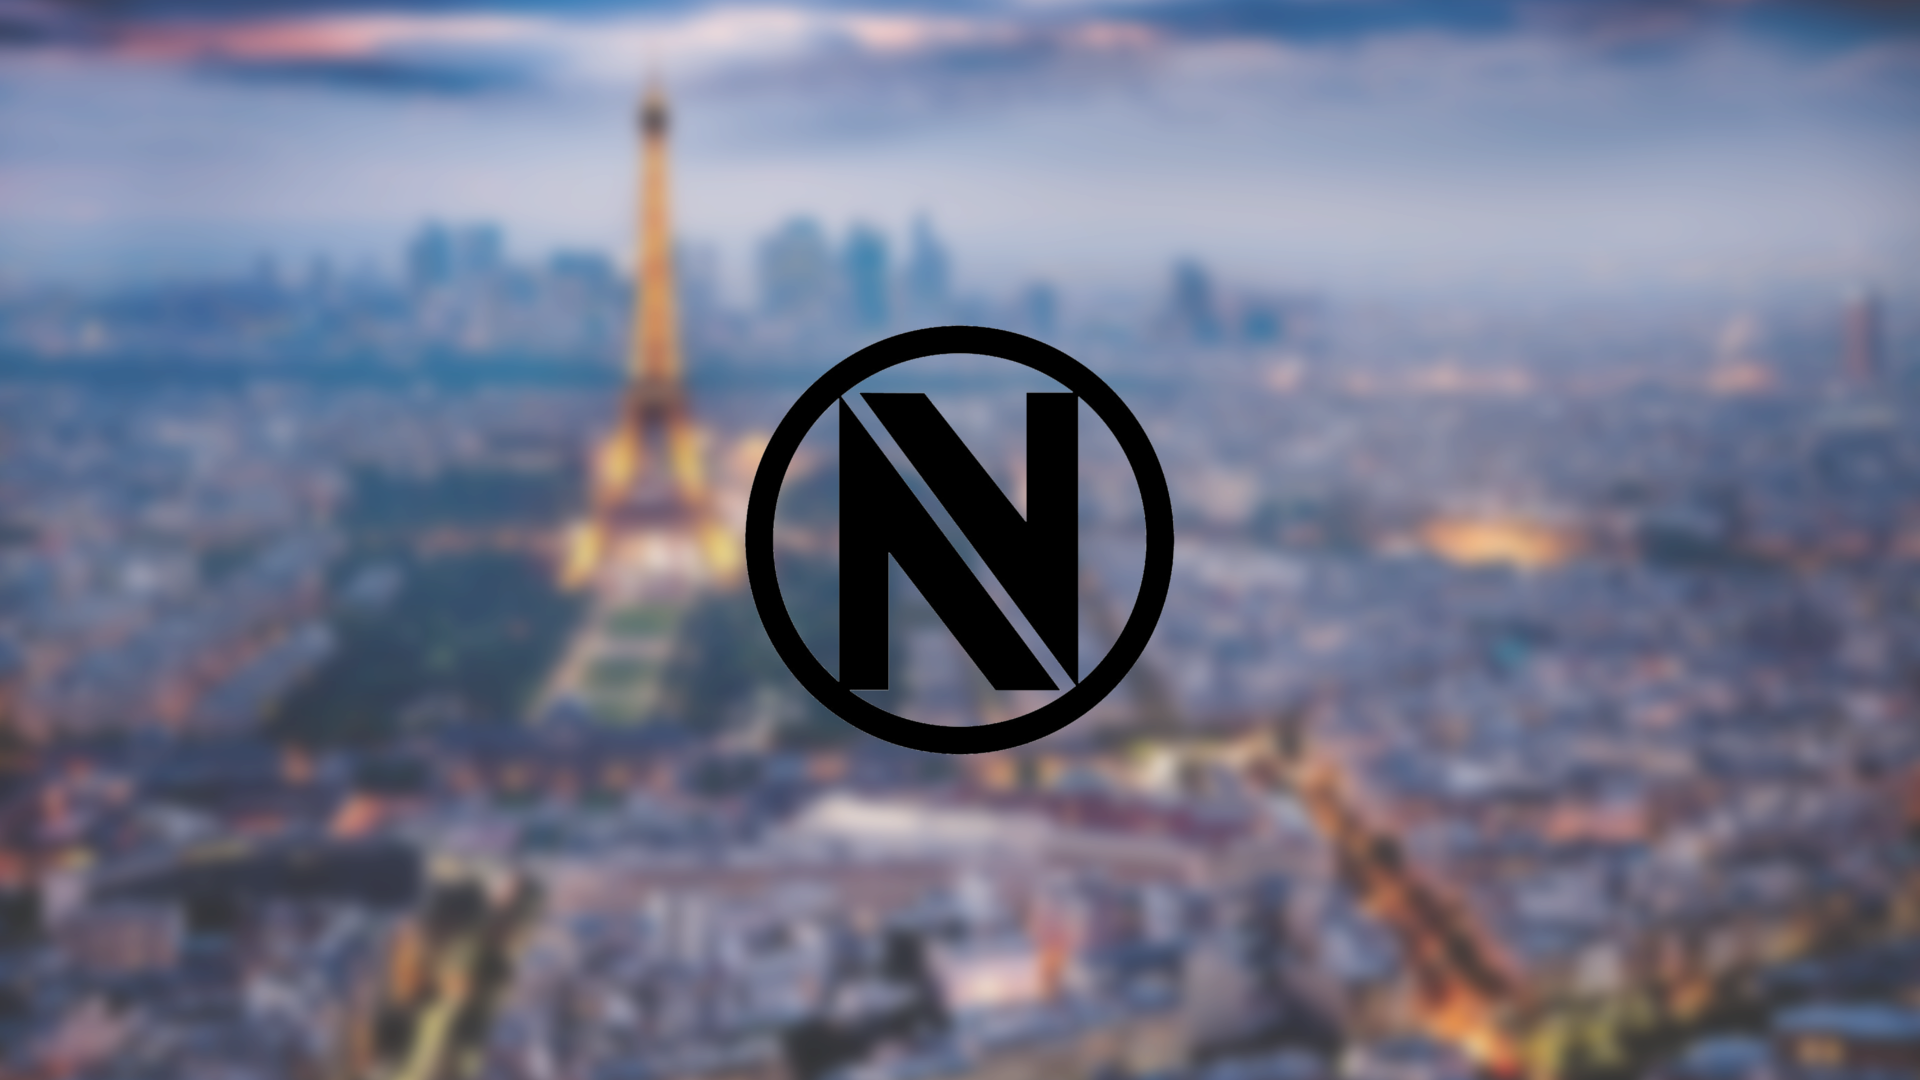 EnVyUs / Paris